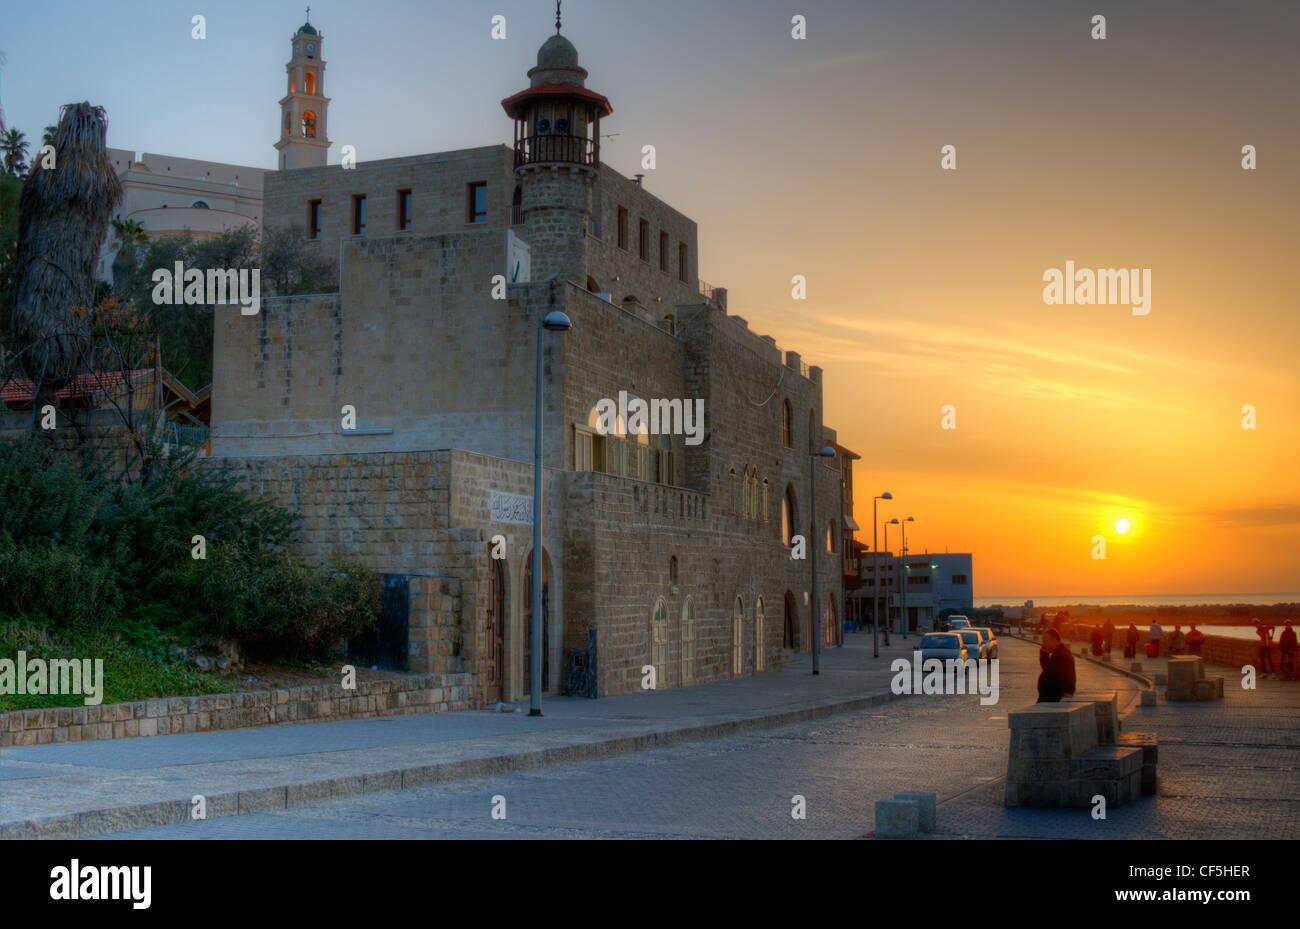 Old Jaffa in Tel Aviv, Israel at sunset. - Stock Image